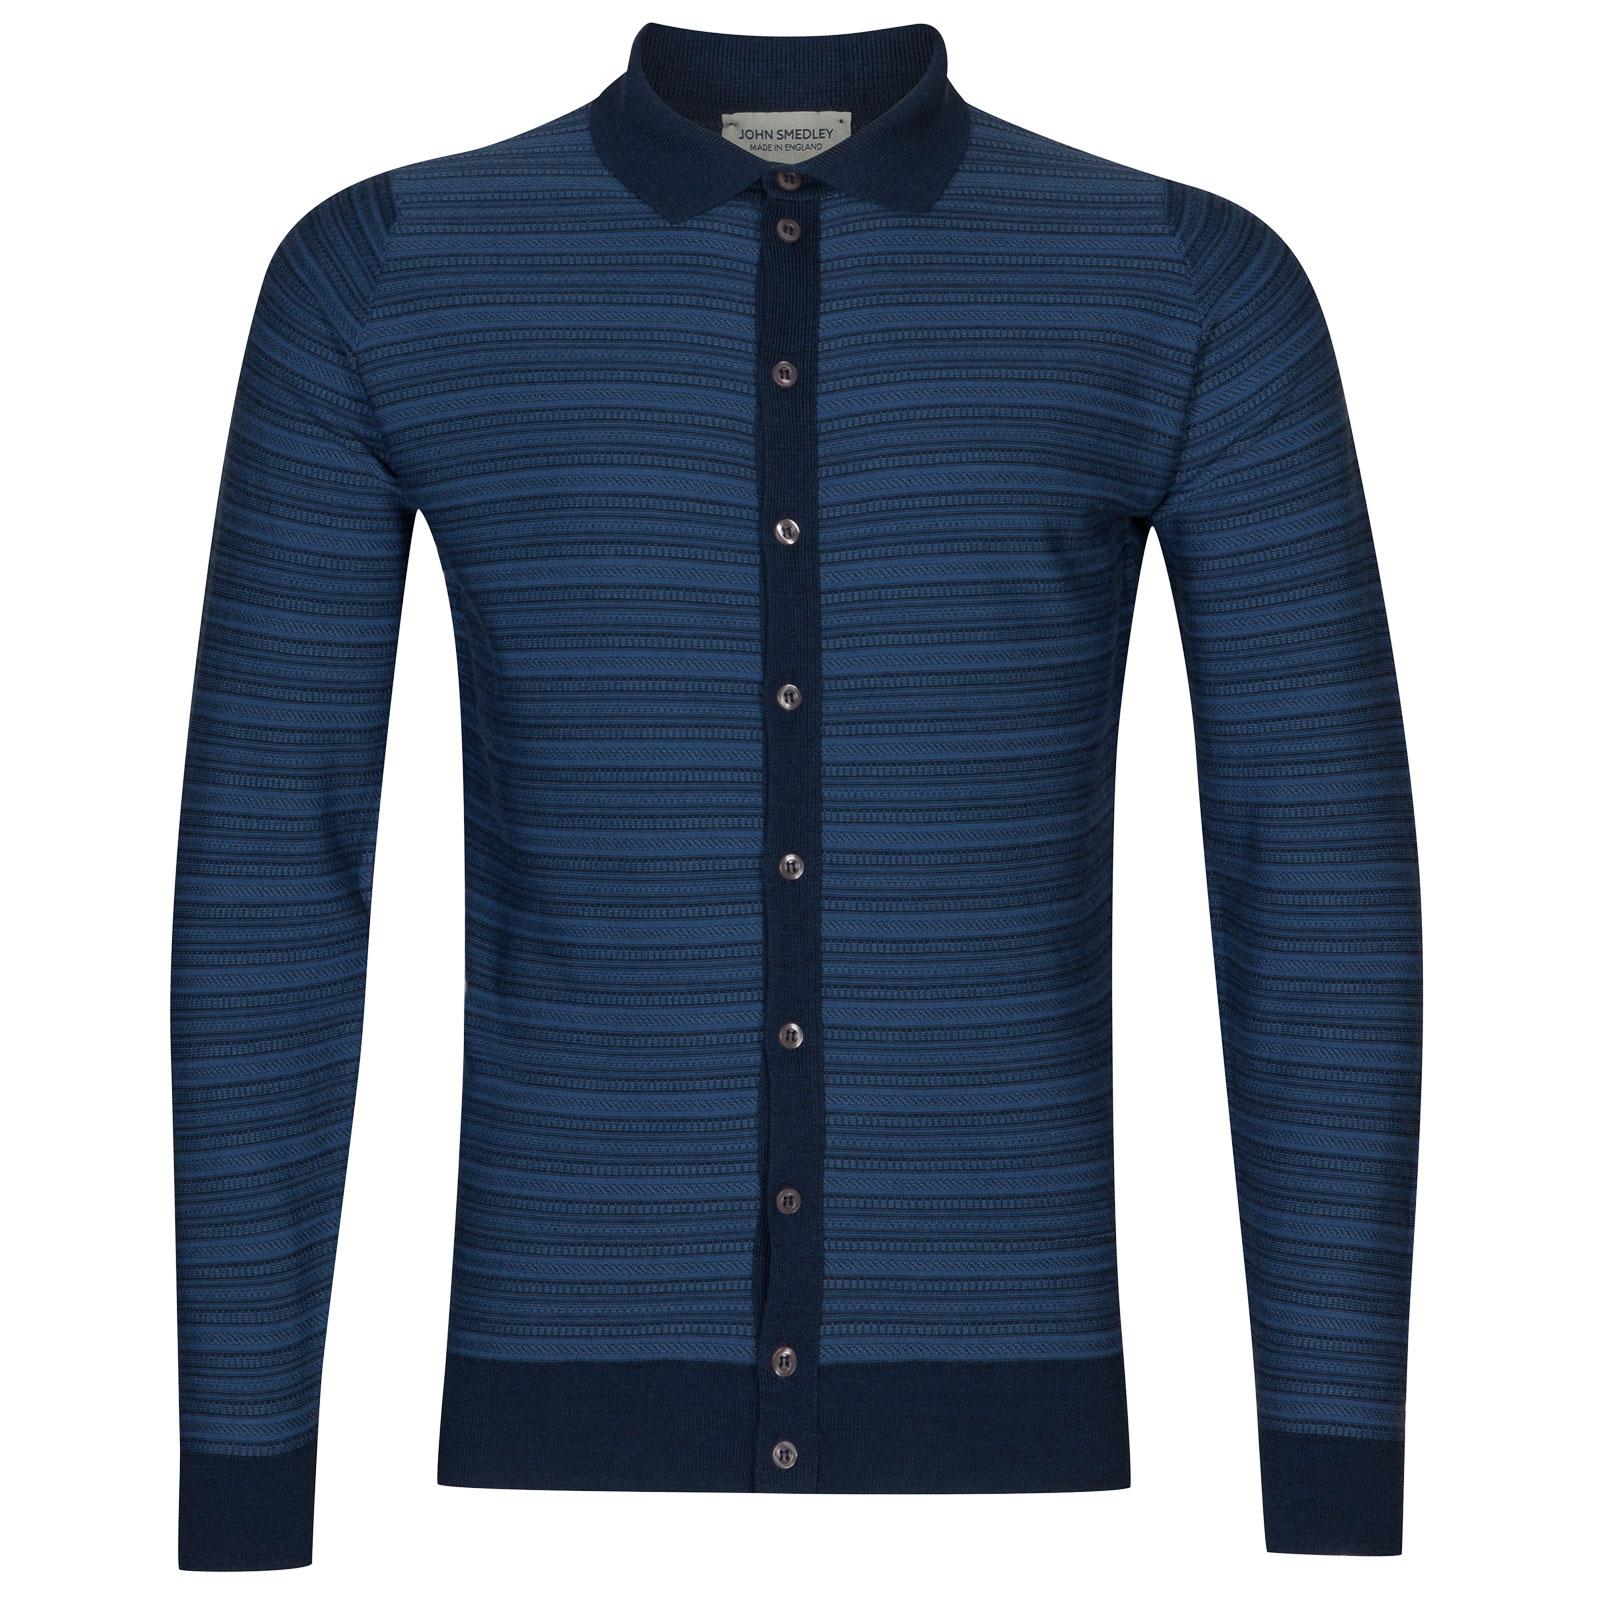 John Smedley hemlock Merino Wool Shirt in Indigo/Derwent Blue-M